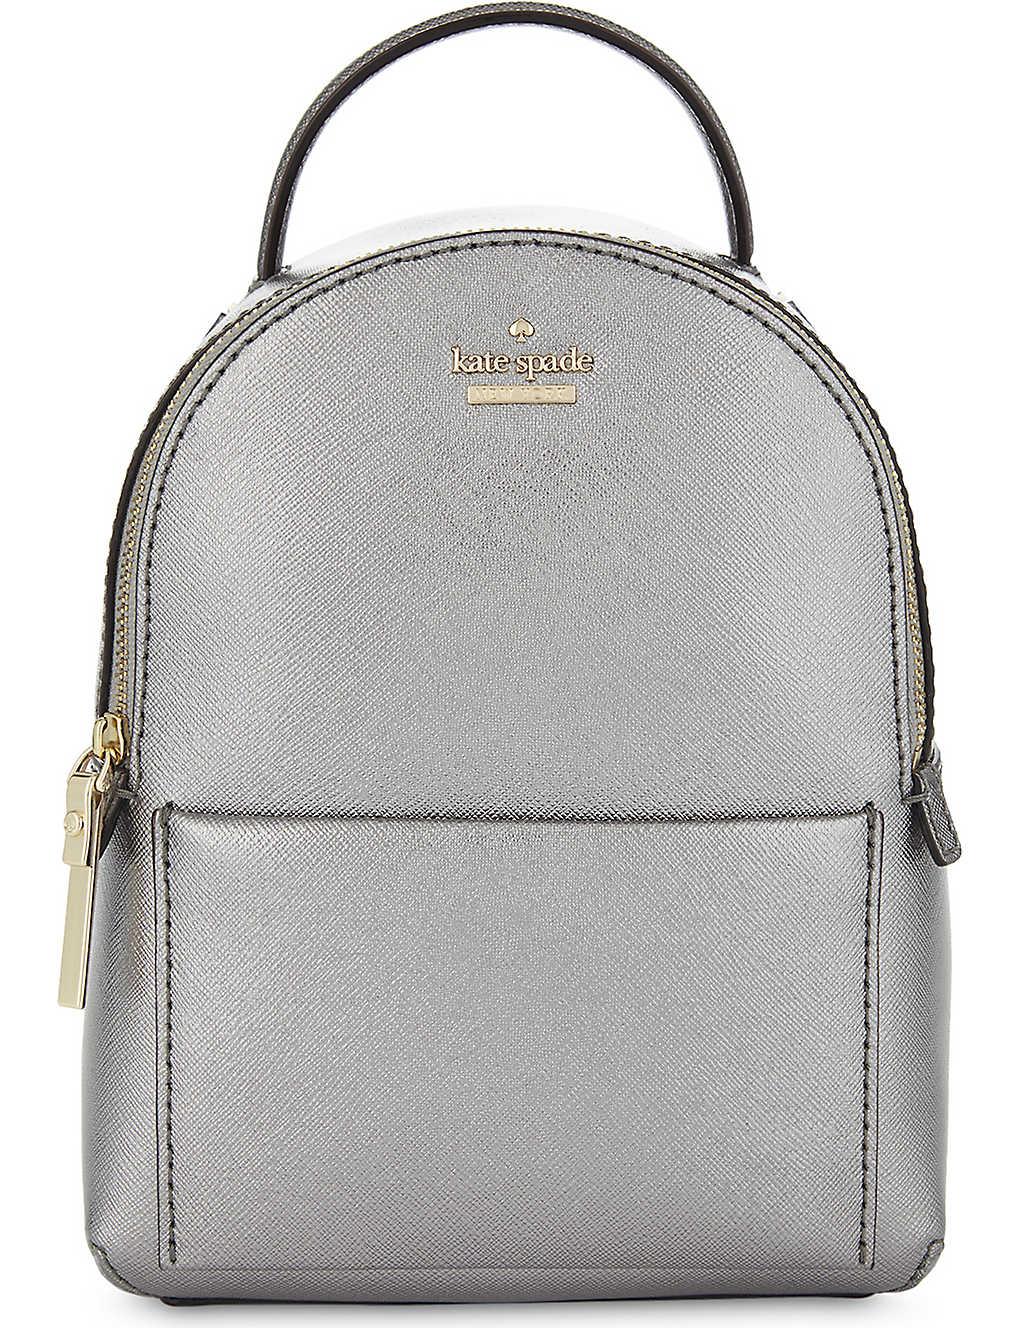 KATE SPADE NEW YORK - Cameron Street Merry mini leather backpack ... c52aa0b22295a